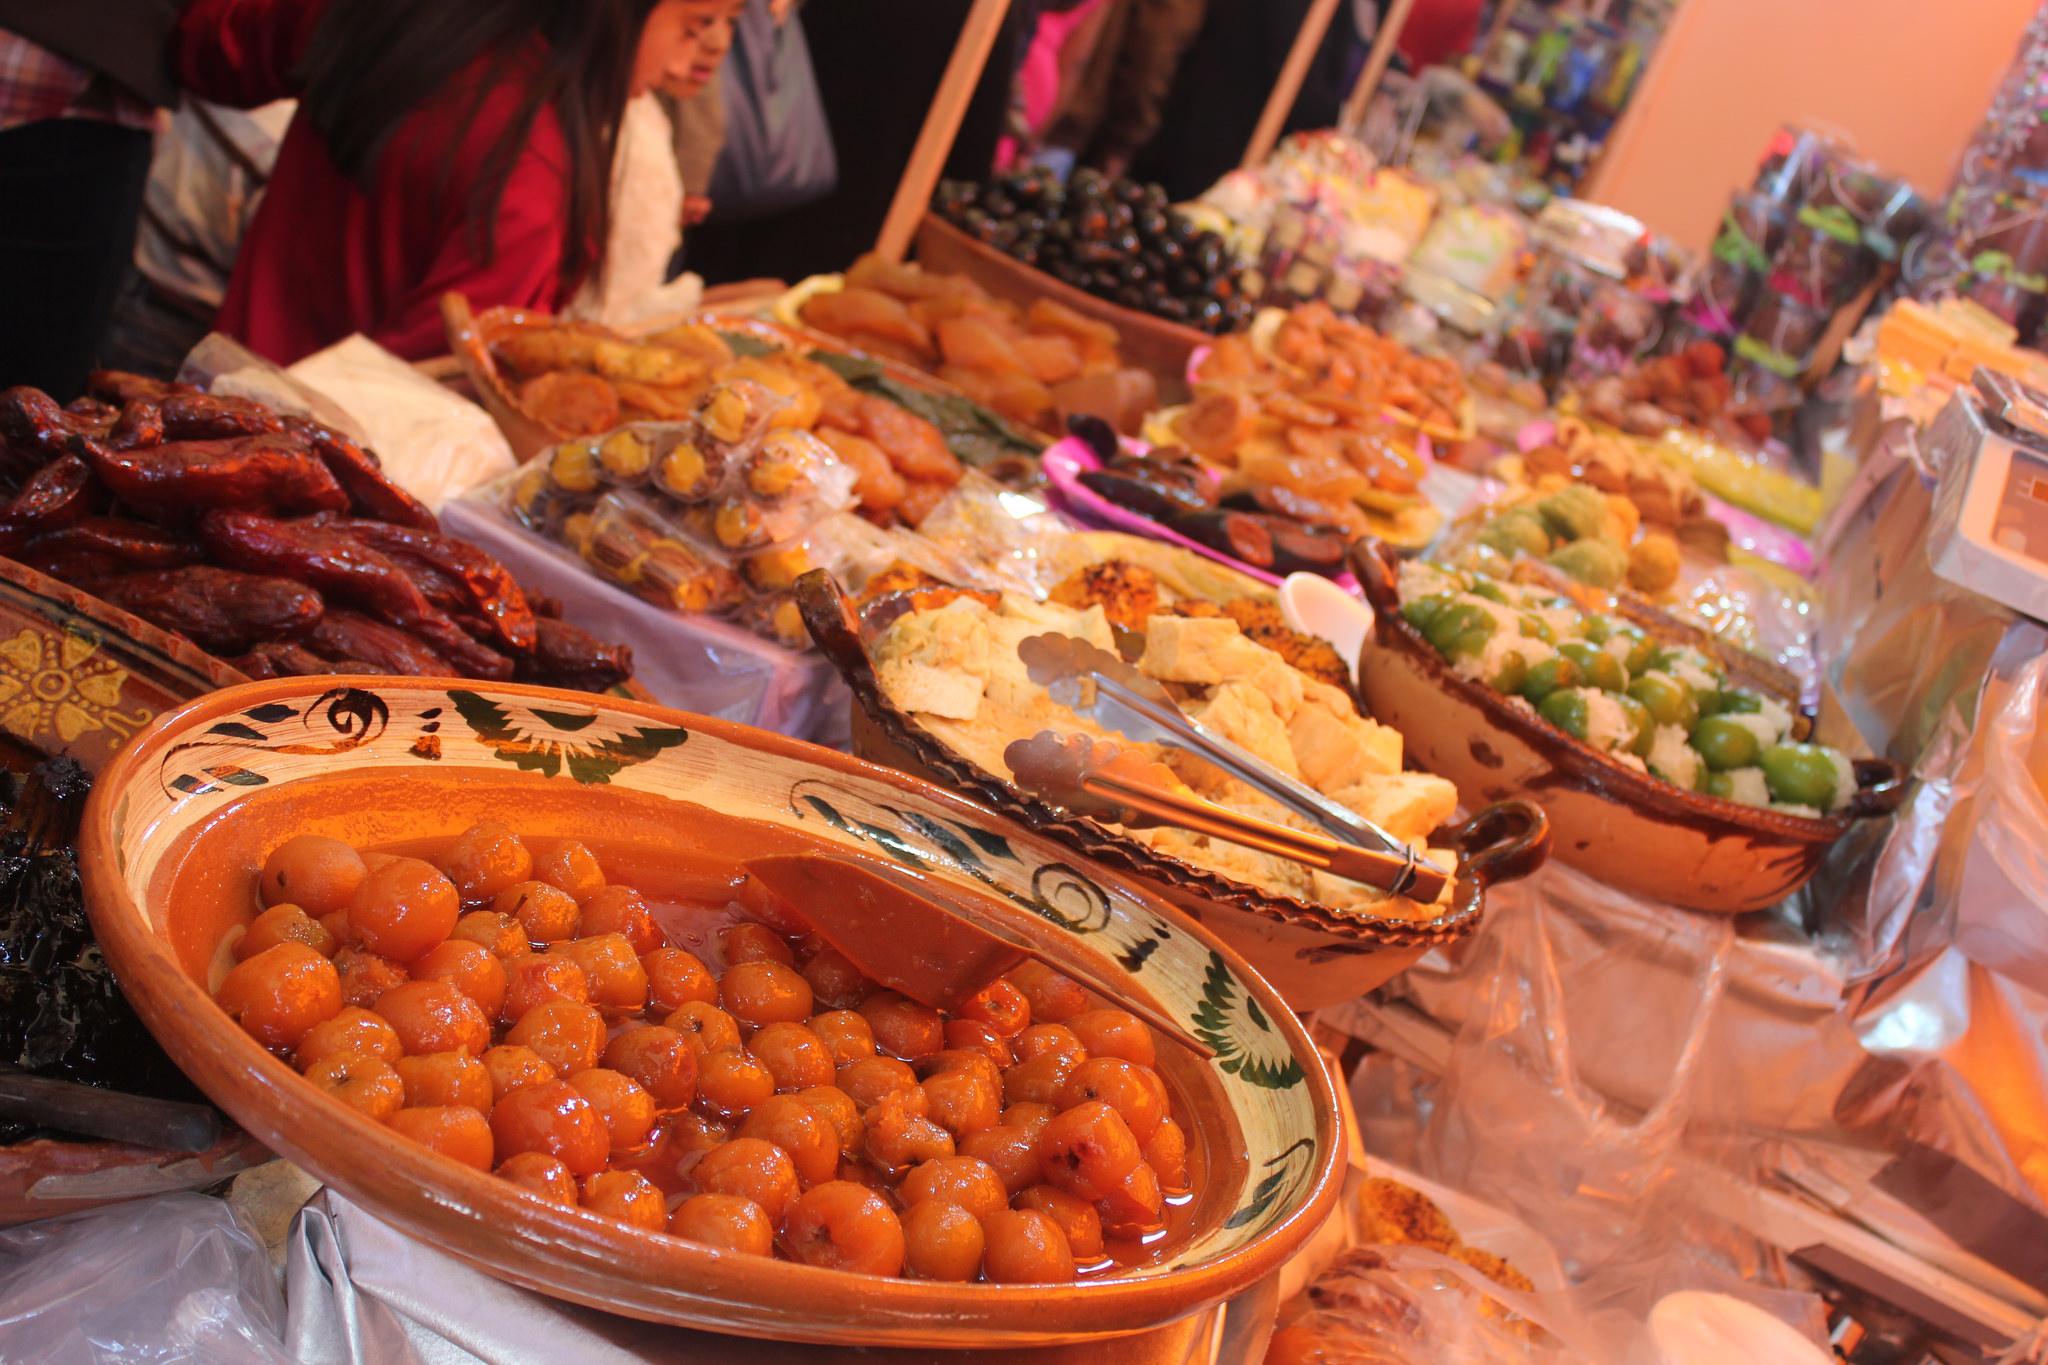 Food lovers will be happy here | © Diego L. Cuevas/Flickr